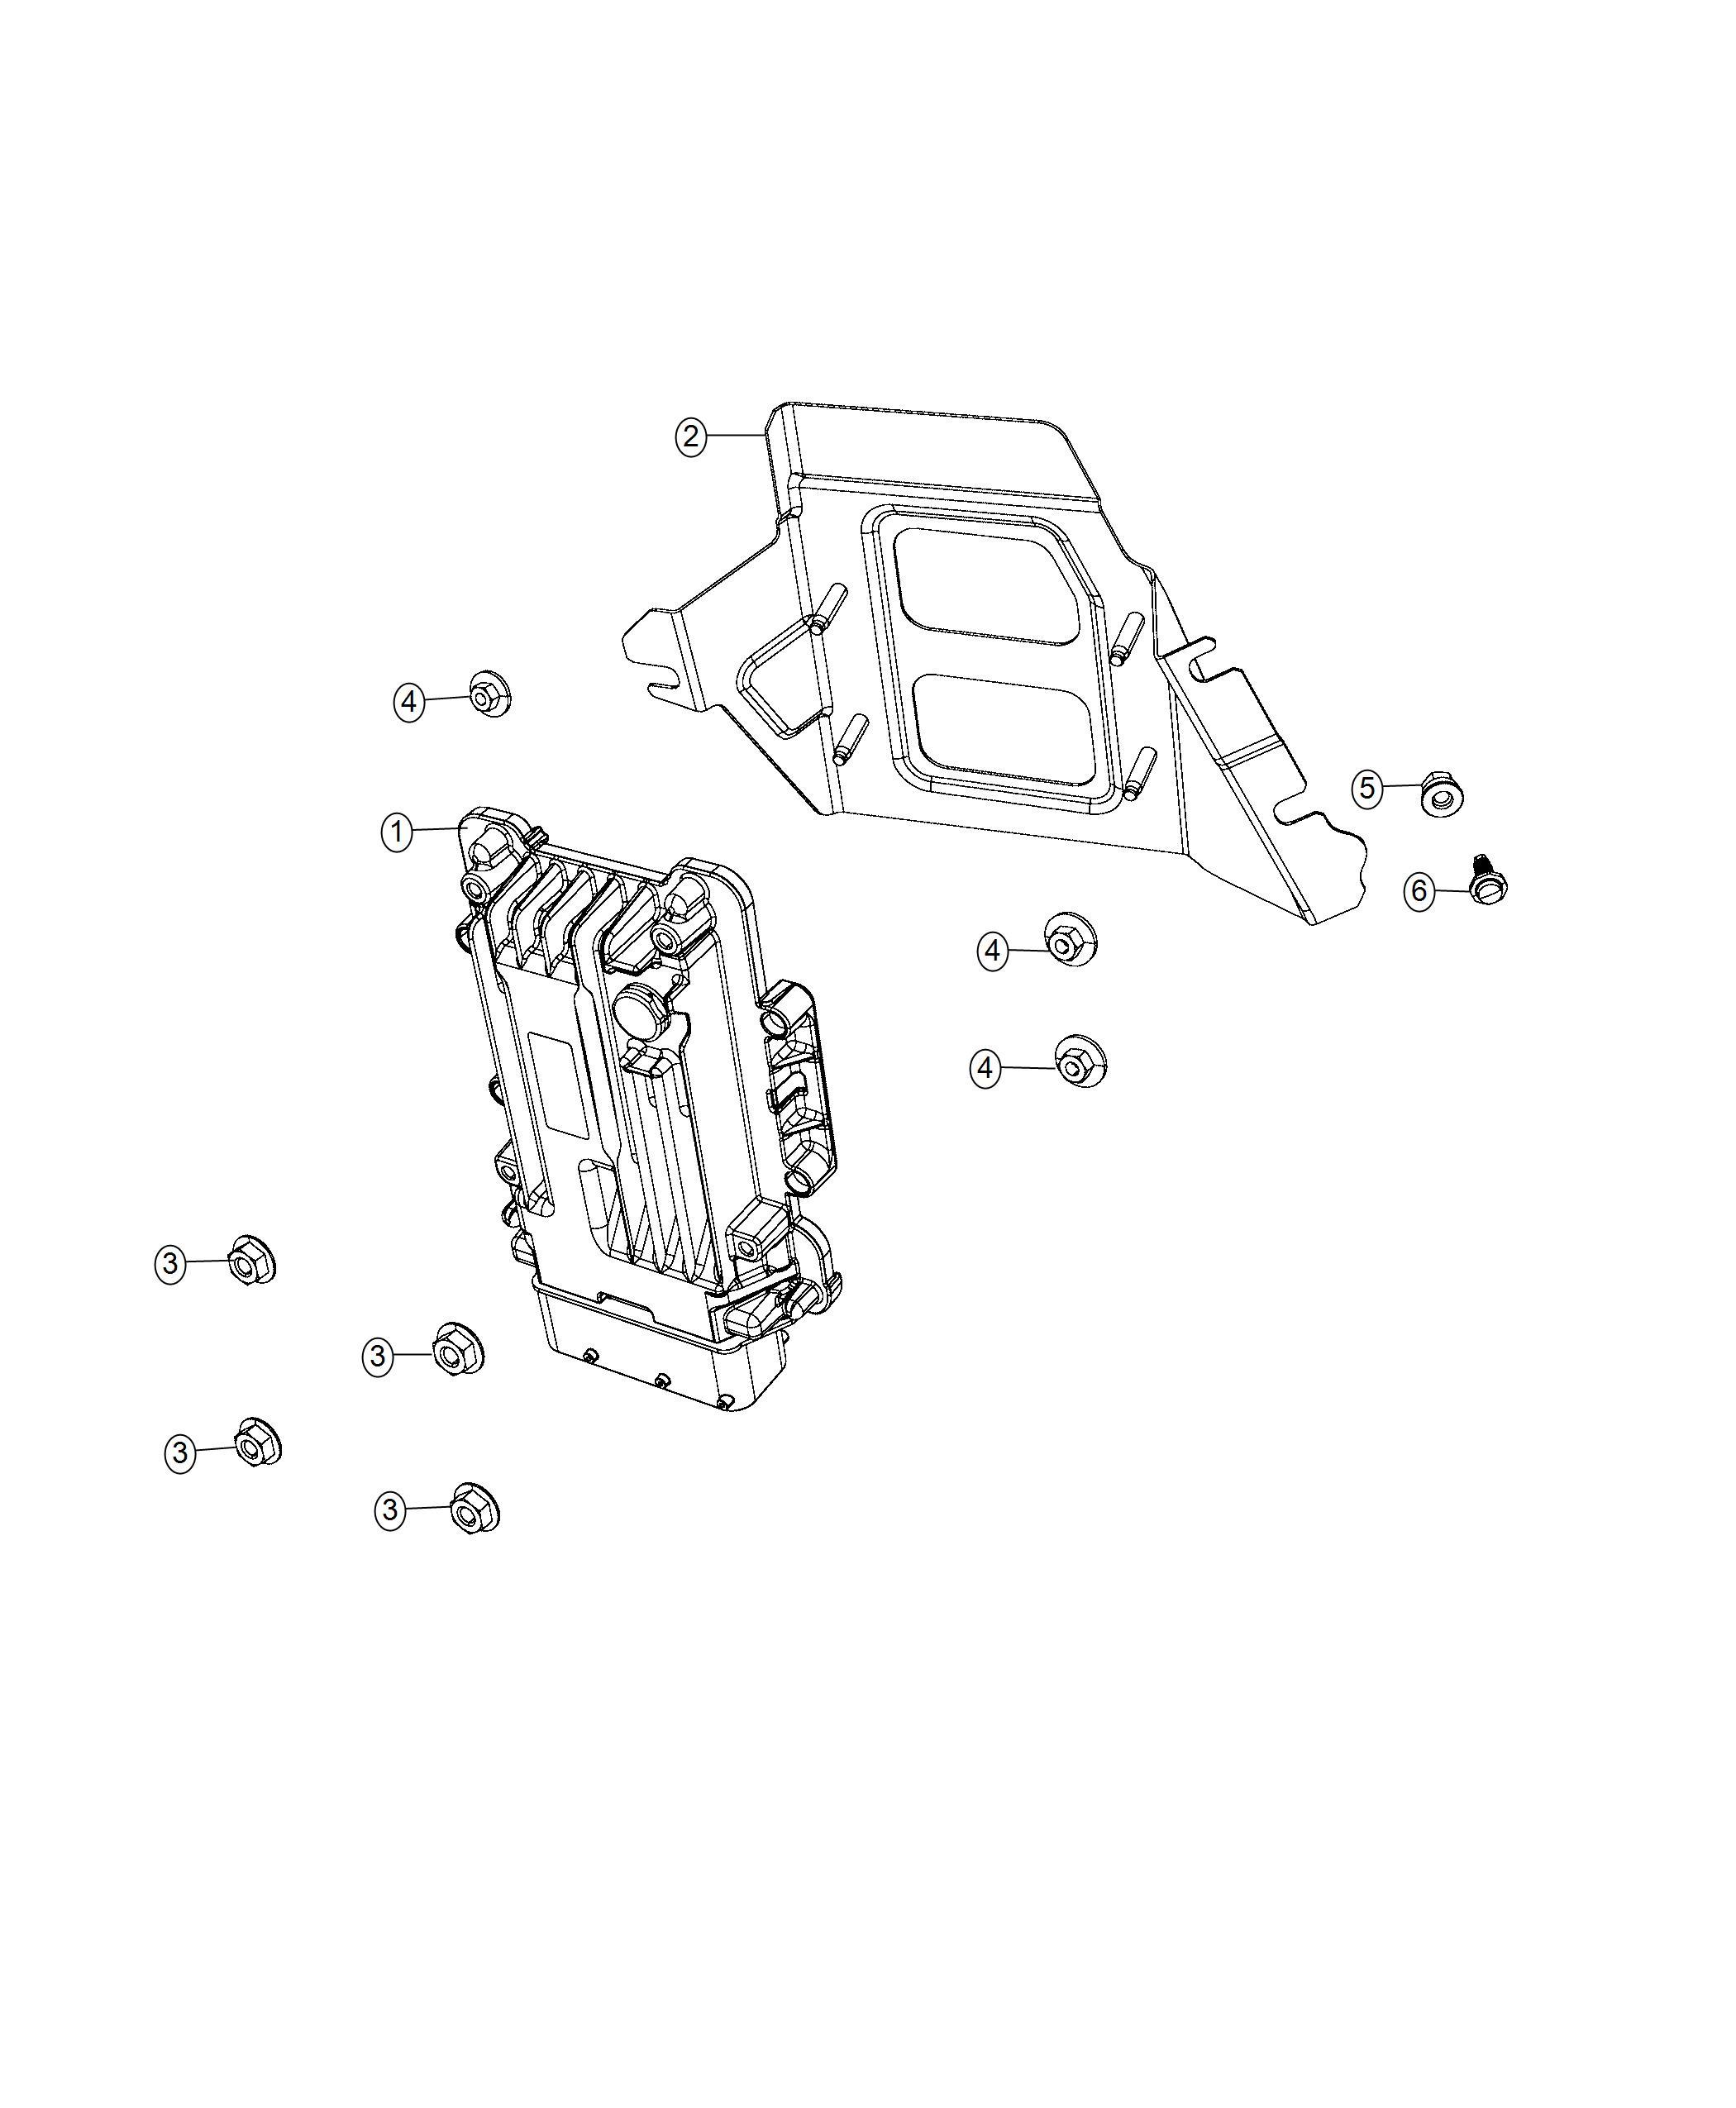 Jeep Compass Module. Awd driveline. [power train parts